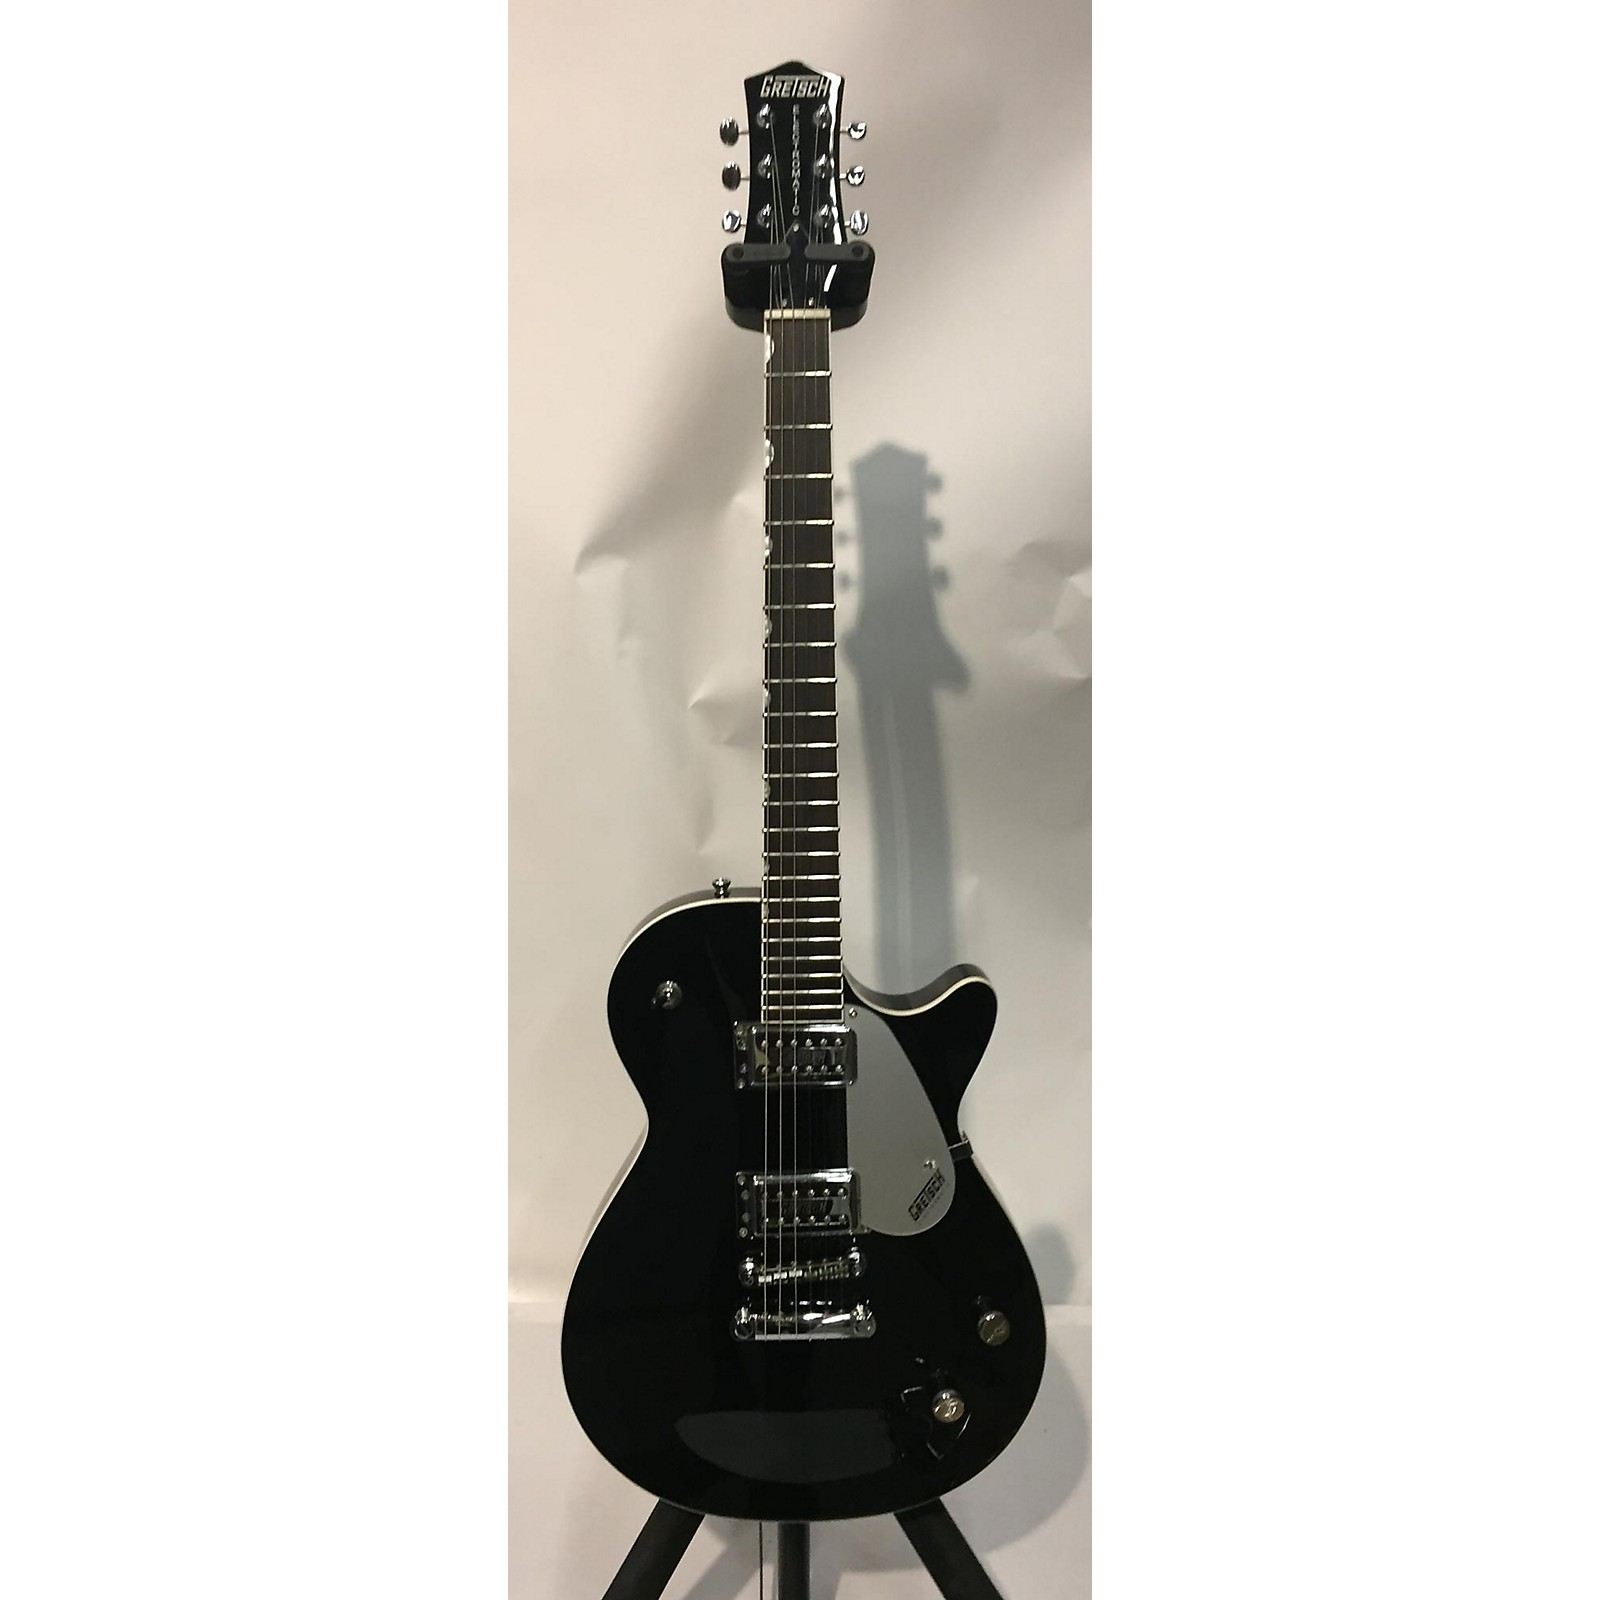 Gretsch Guitars G5230 Solid Body Electric Guitar